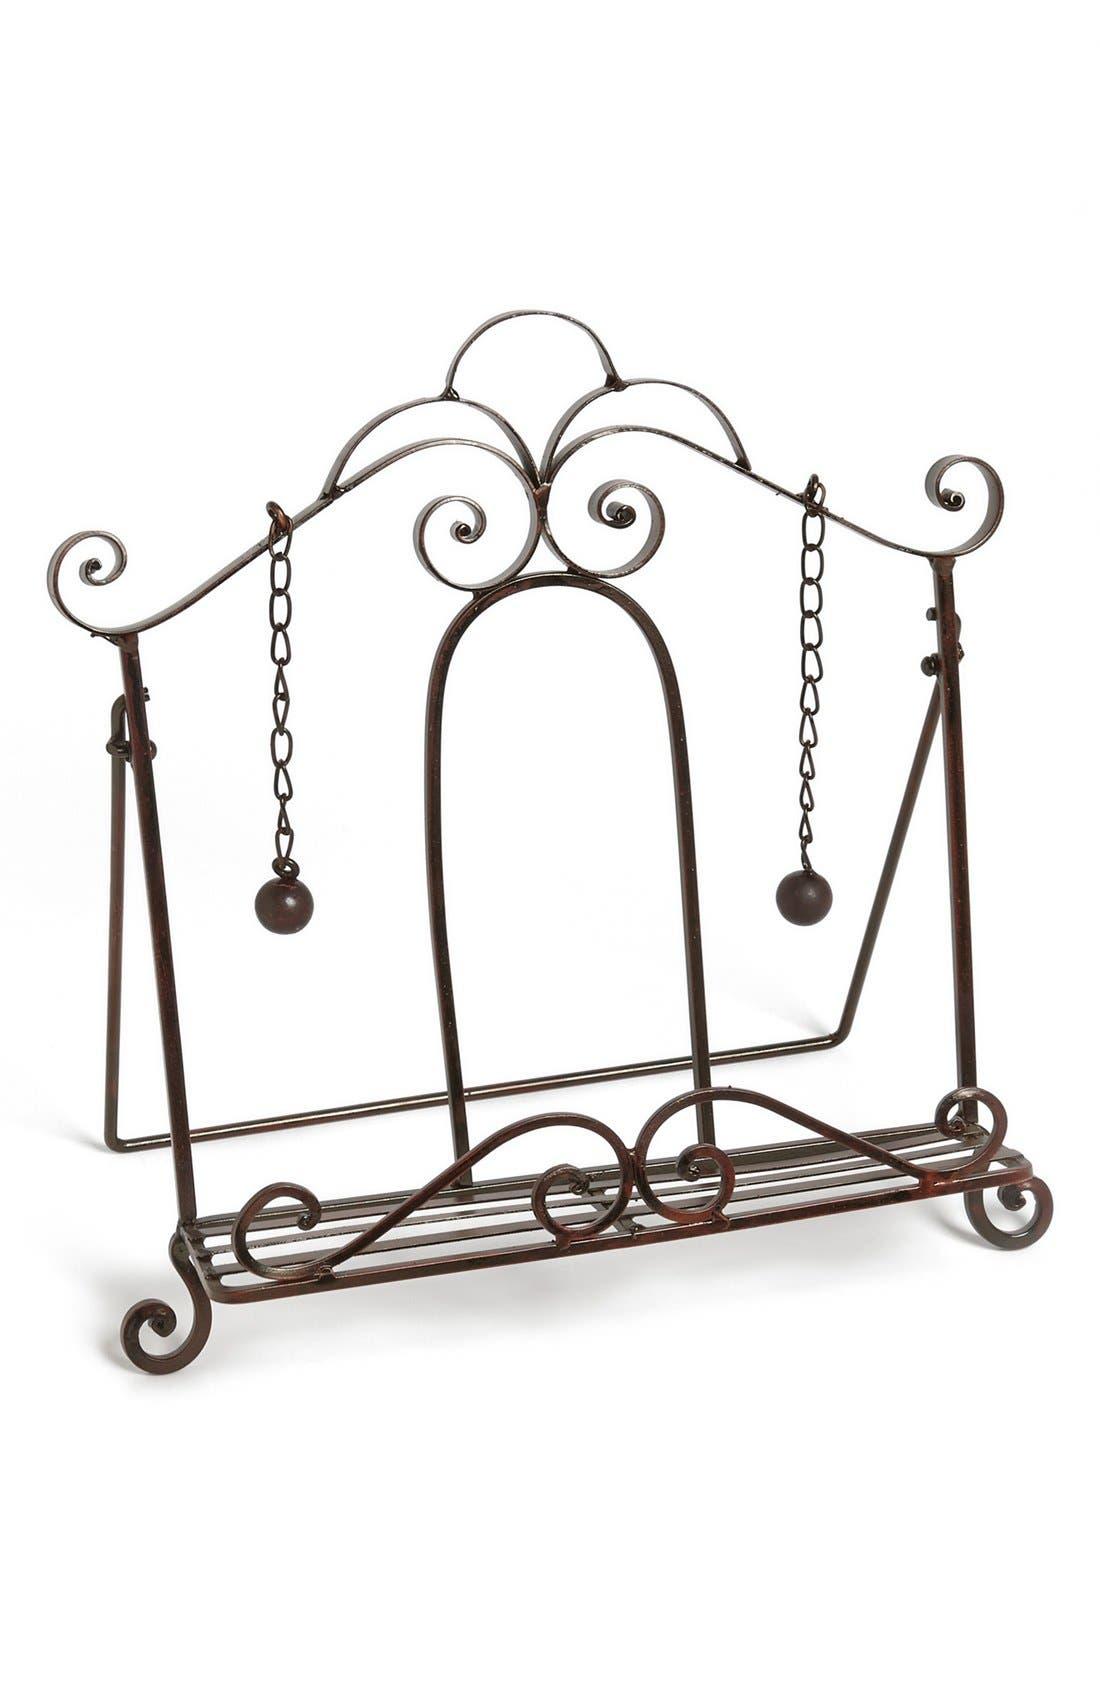 Main Image - Iron Book Stand